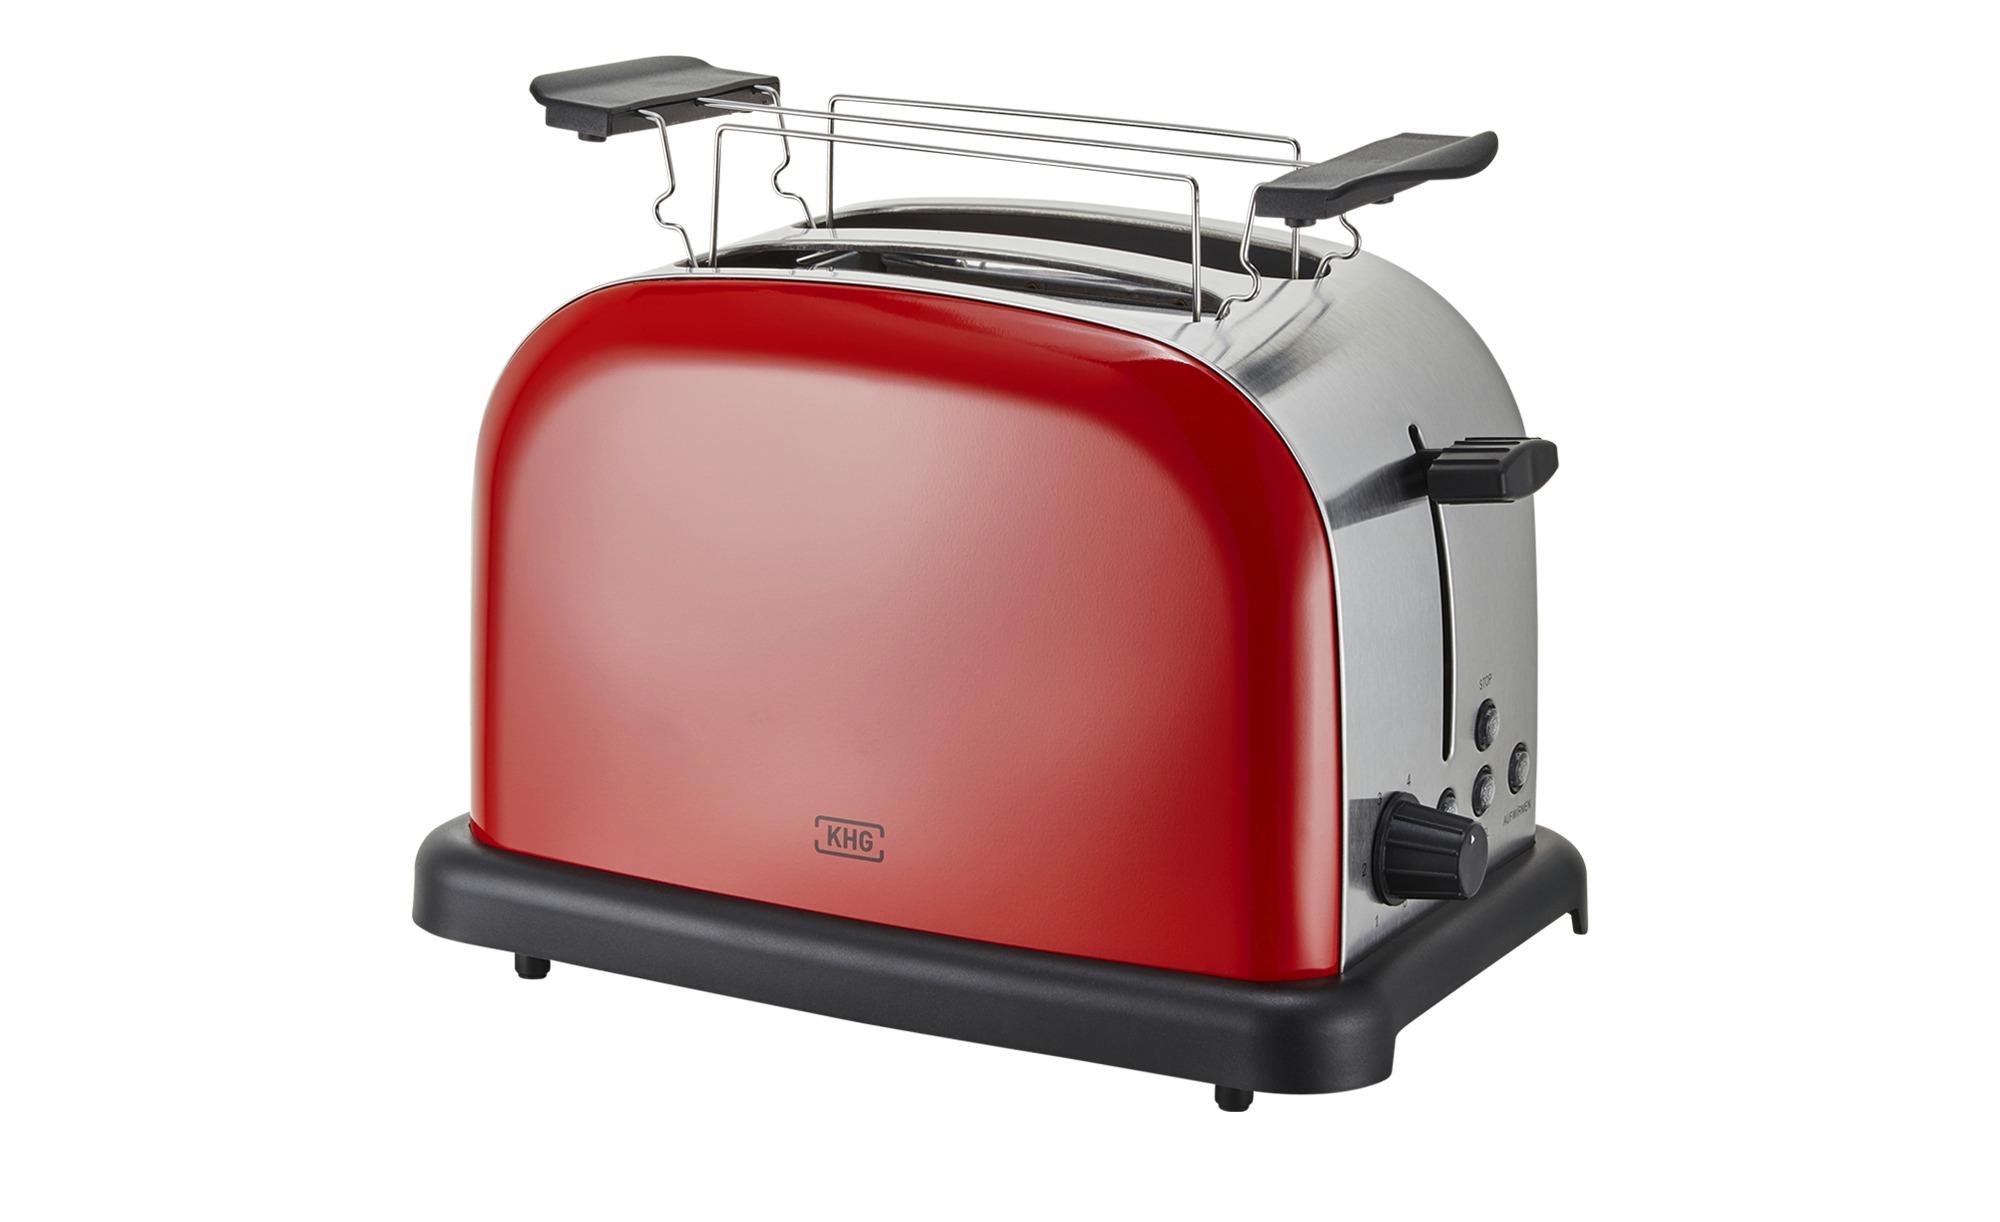 KHG Toaster  TO-1005 (RS) - rot - Edelstahl, Kunststoff - 30 cm - 20 cm - 18,3 cm - Elektrokleingeräte > Toaster - Möbel Kraft | Küche und Esszimmer > Küchengeräte > Toaster | KHG